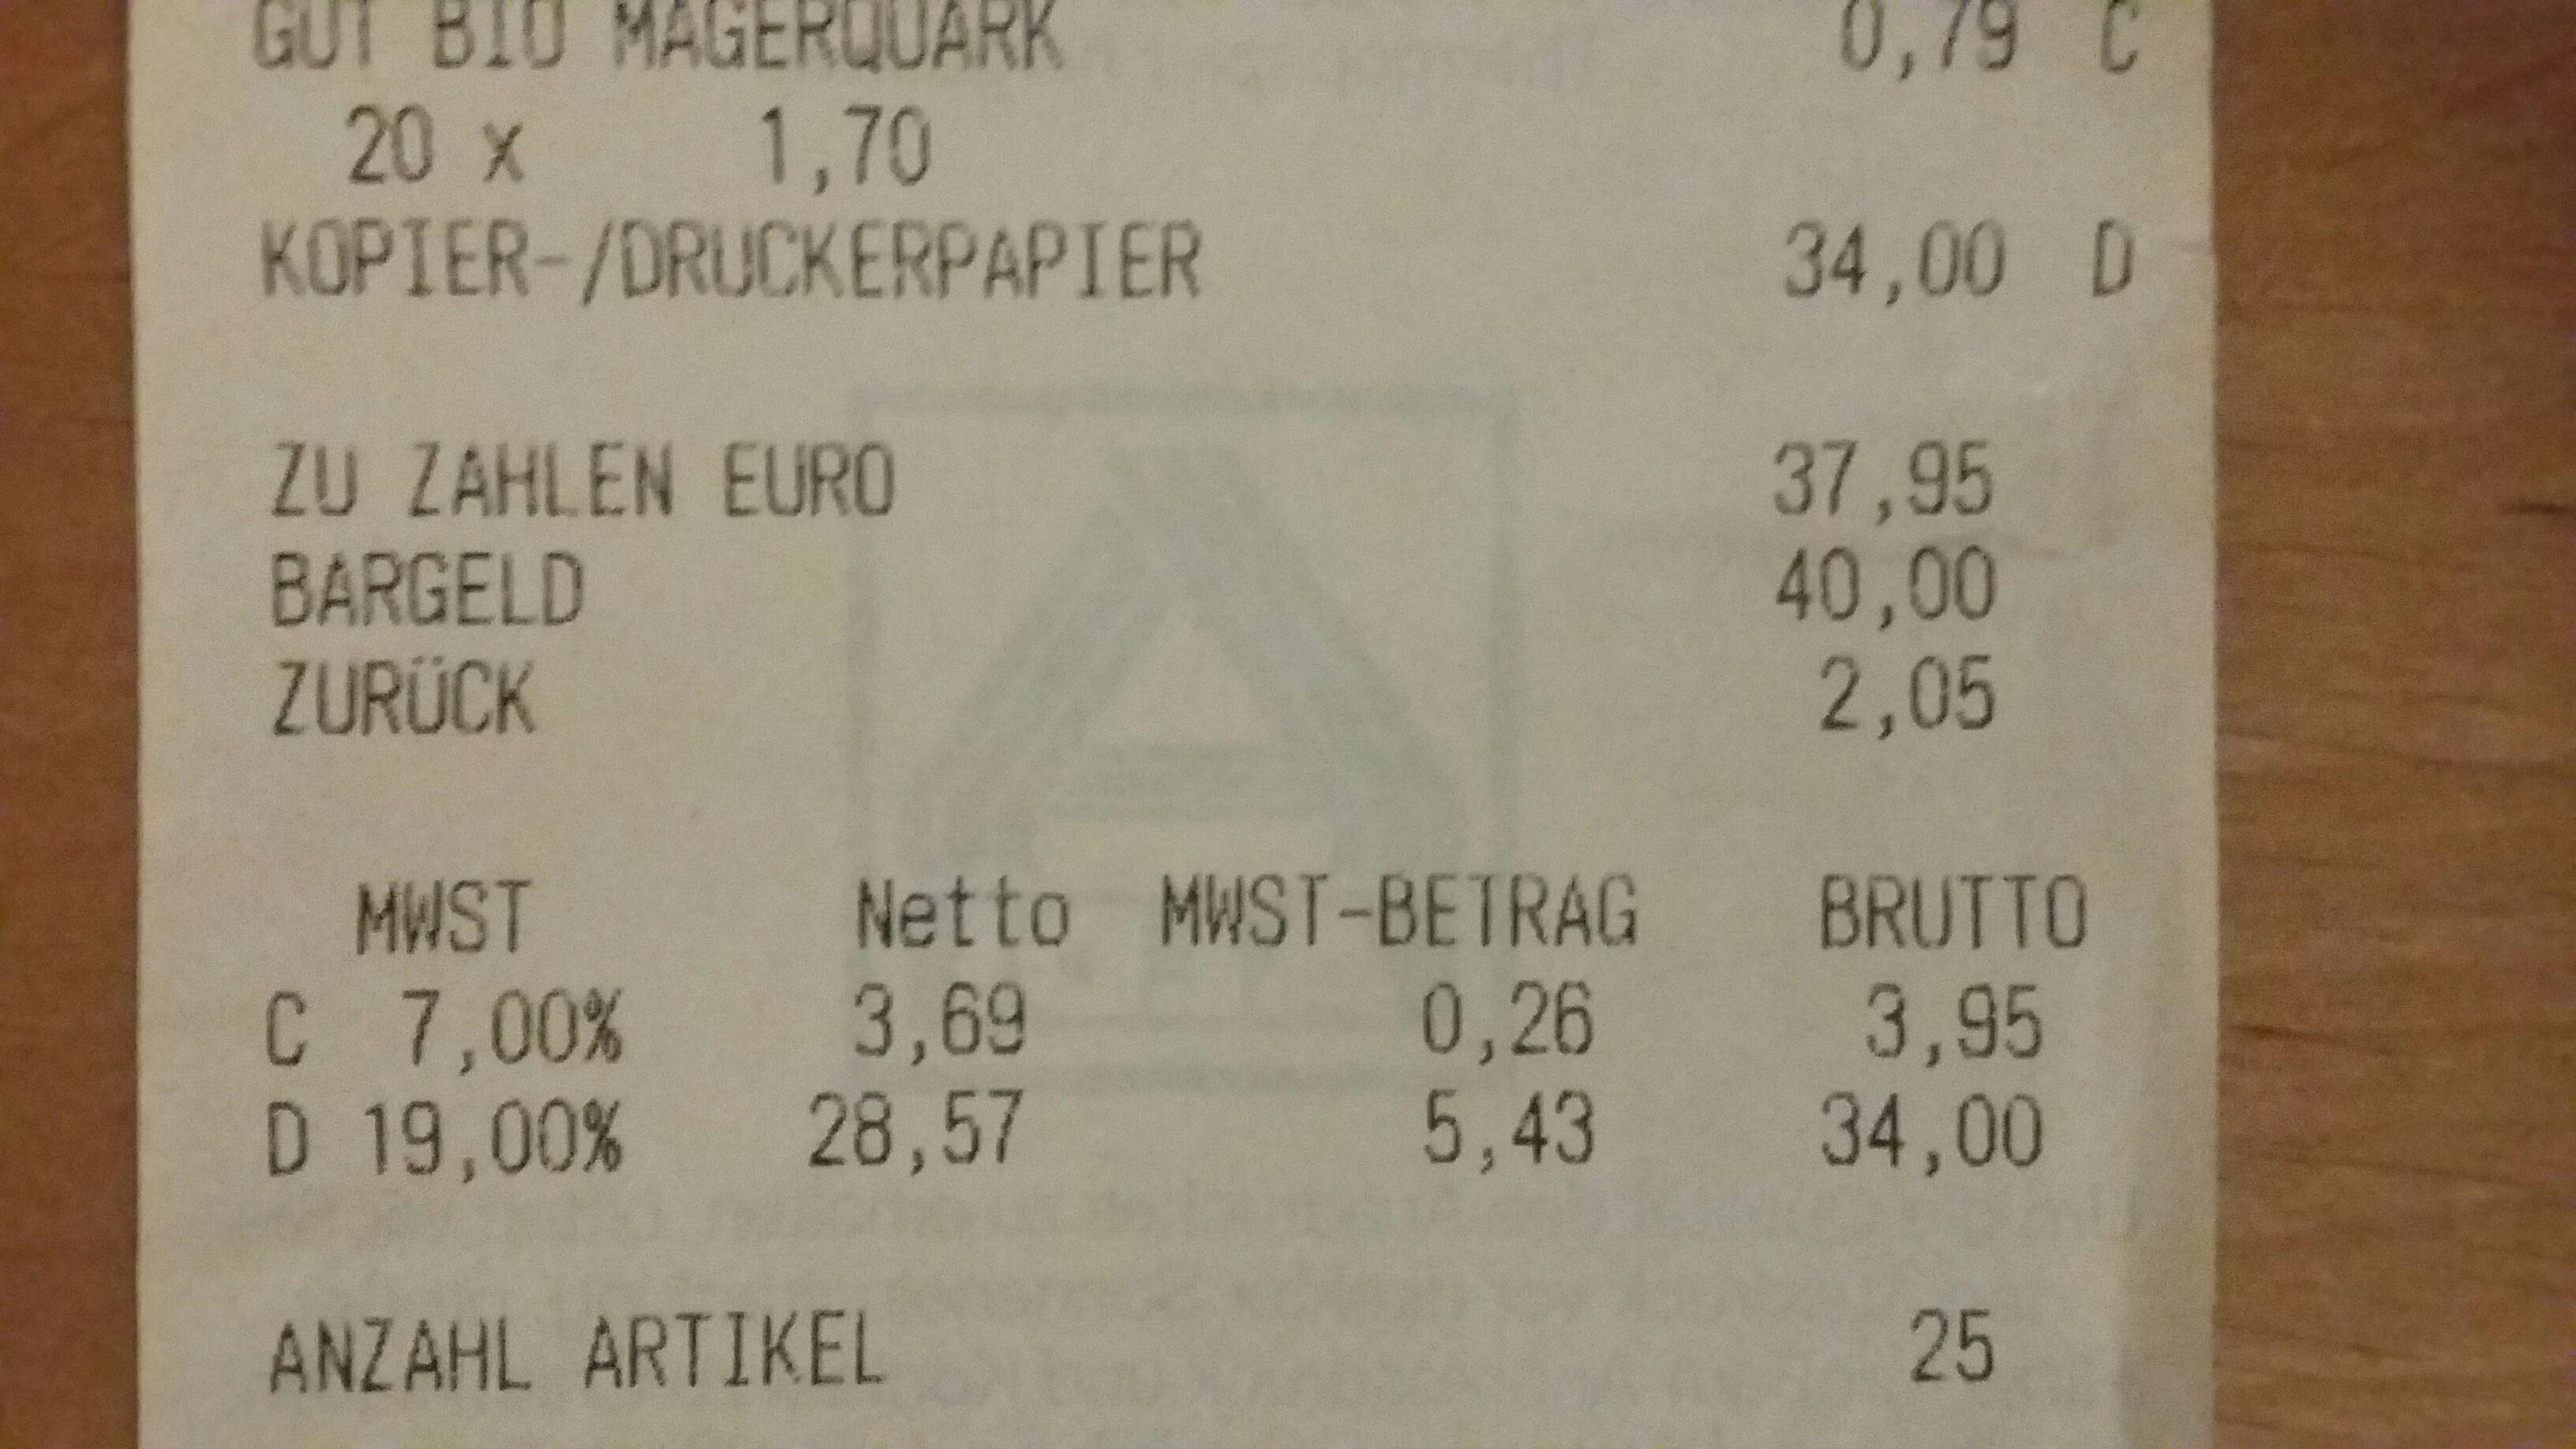 Kopierpapier 500 Blatt 1,70€ [Aldi Nord] [lokal]